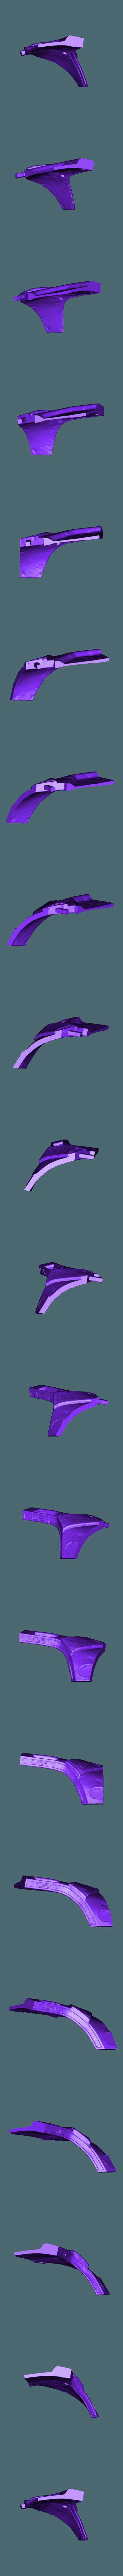 Armory_Damaged_Print33.stl Download OBJ file Armory - Knights of Ren Helmet (damaged), 3D print model • 3D print design, 3D-mon